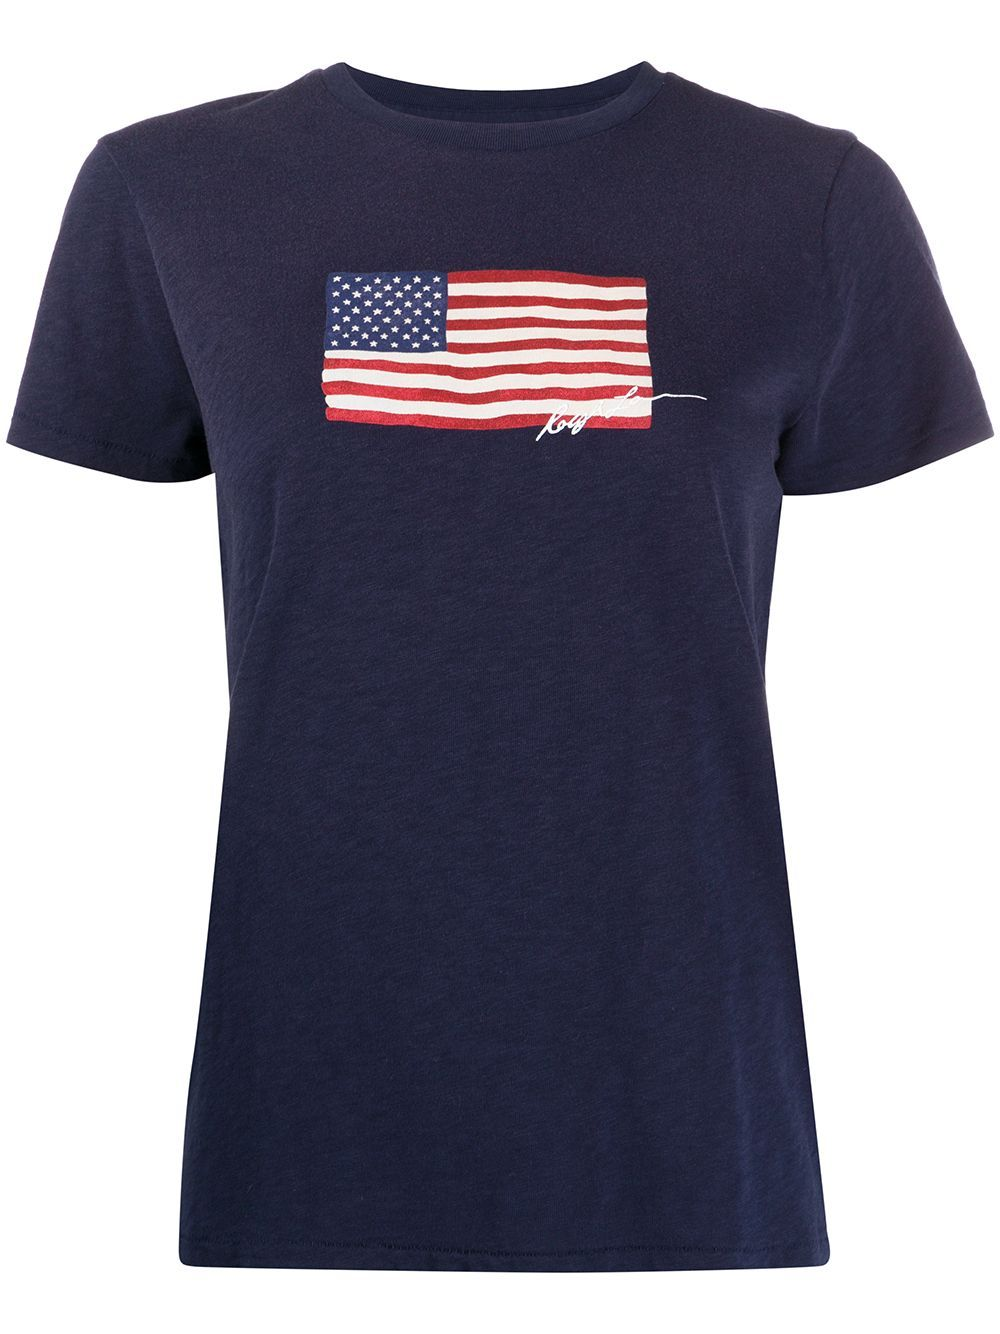 Polo Ralph Lauren Usa Flag T Shirt Farfetch In 2020 Polo Ralph Lauren Usa Shirt Shirts